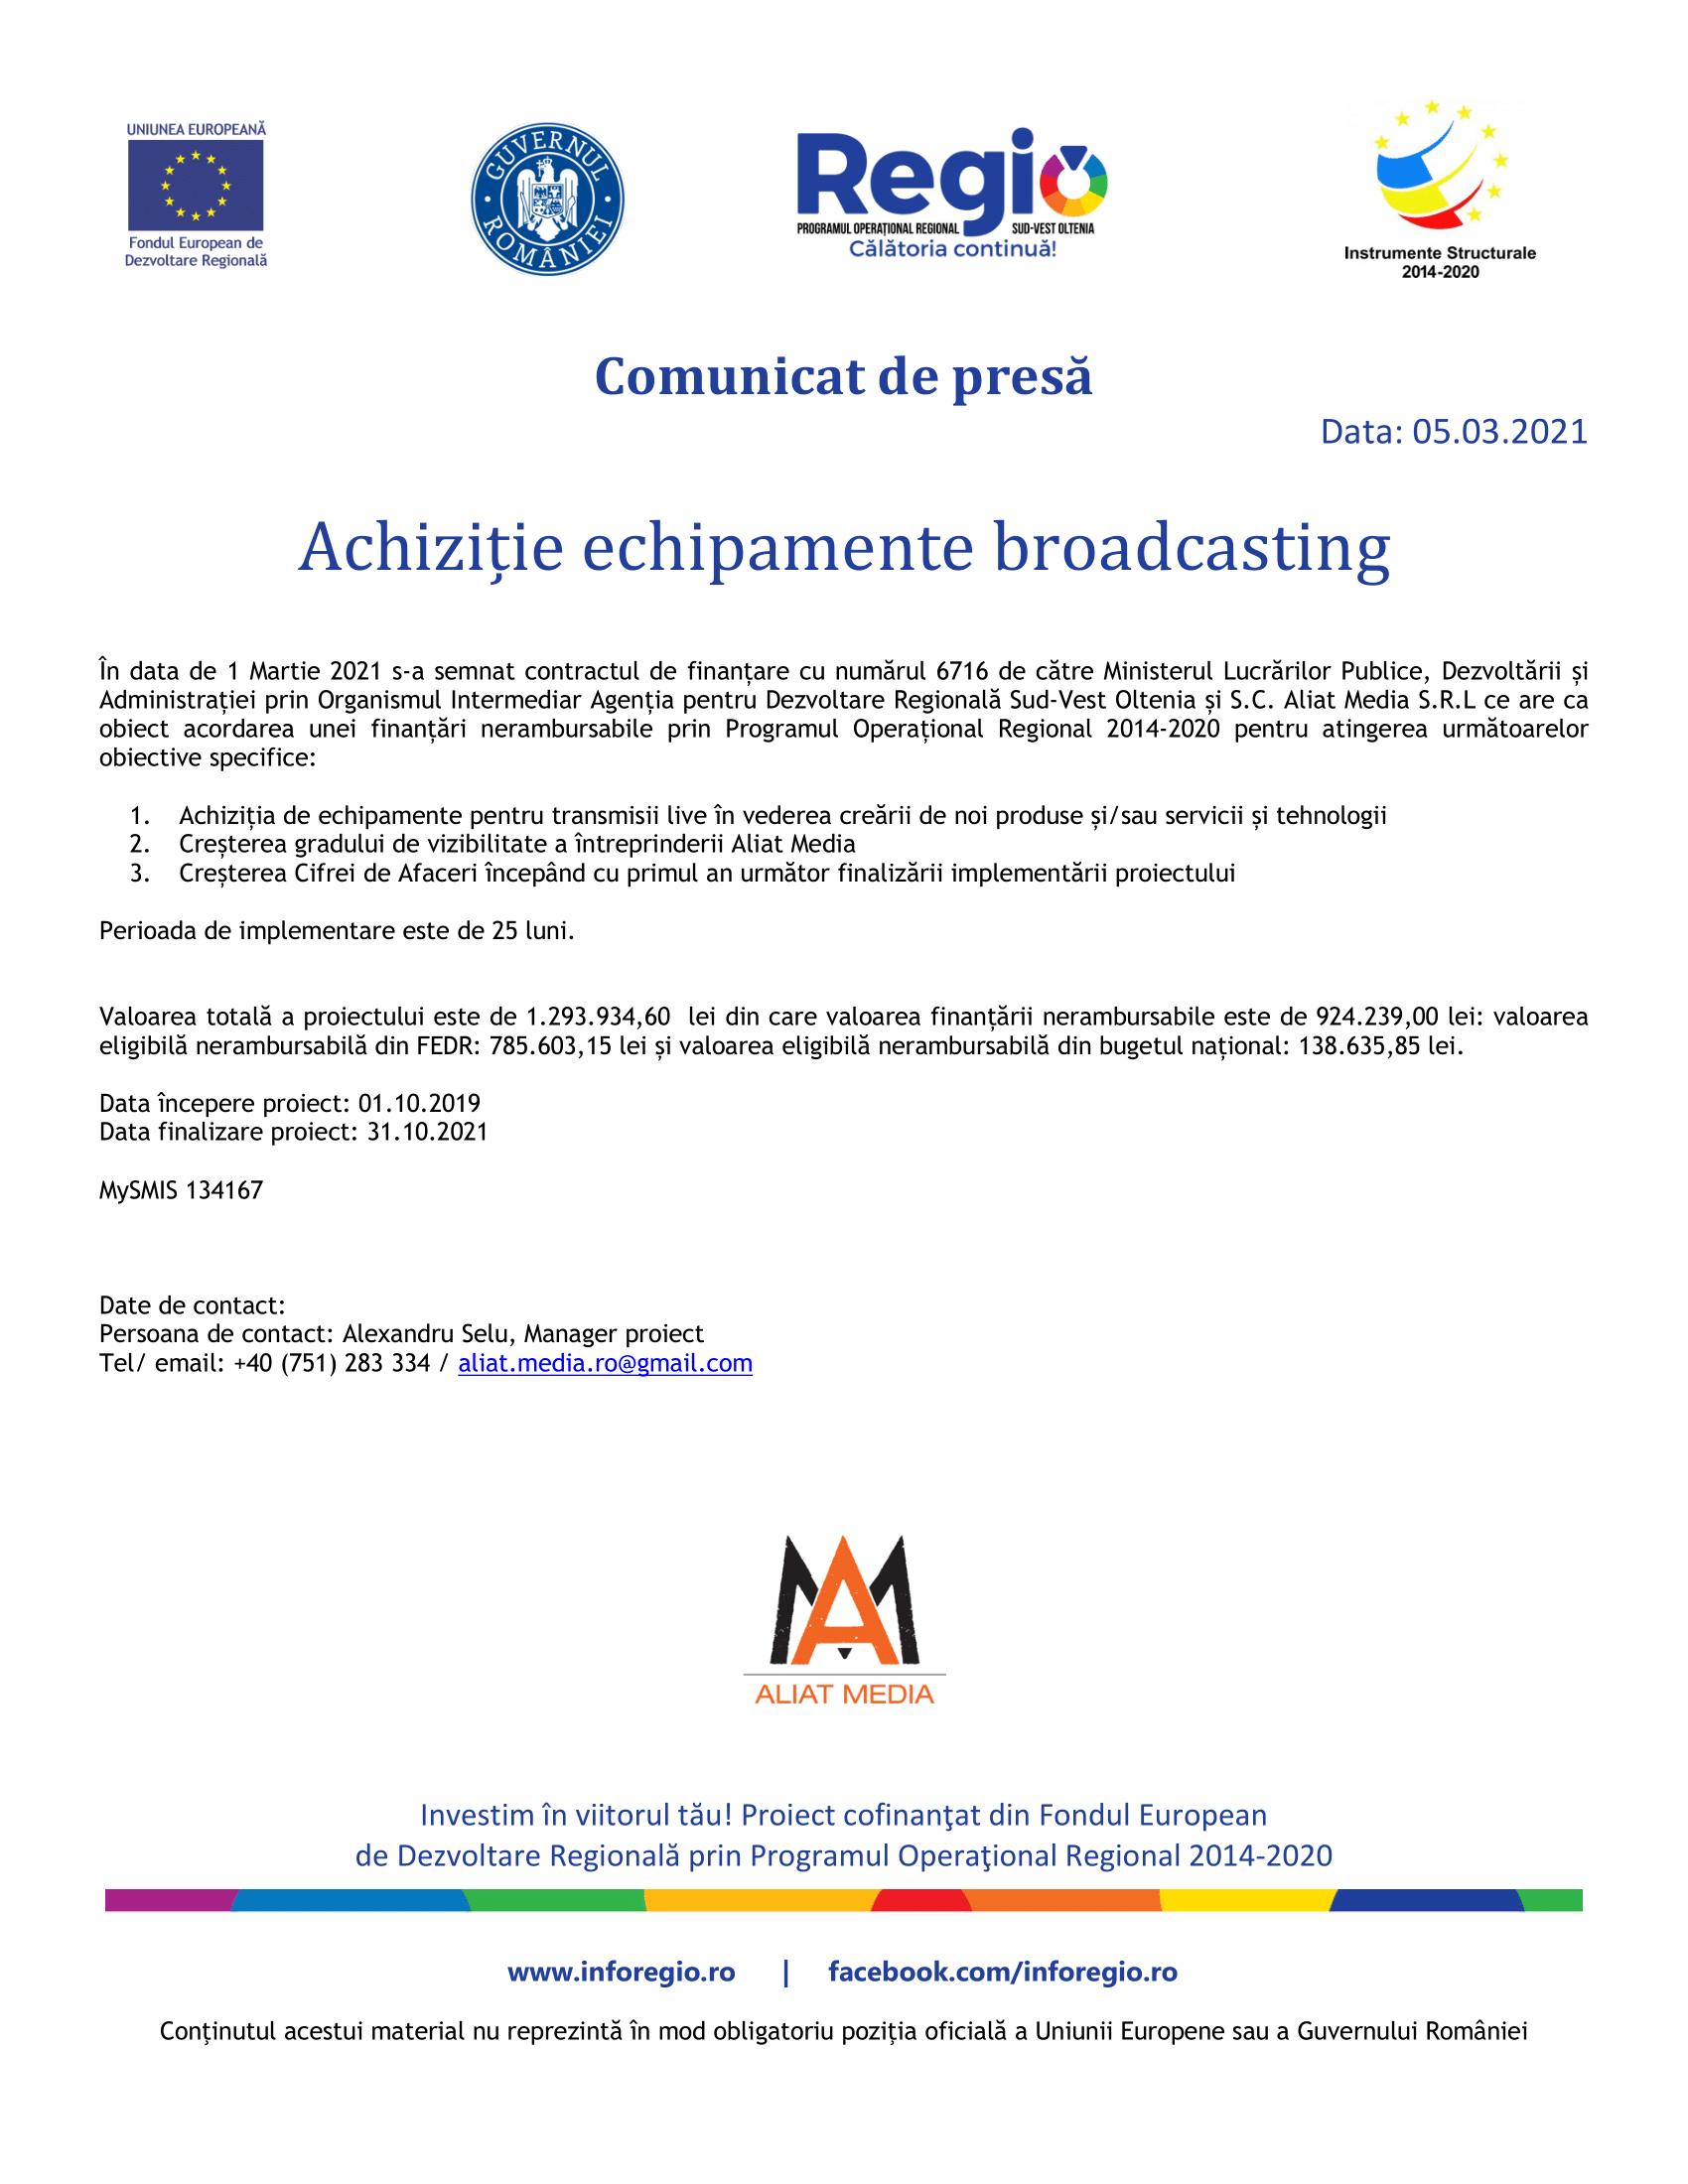 1. Comunicat de presa lansare proiect_Aliat Media SRL_SMIS 134167-1